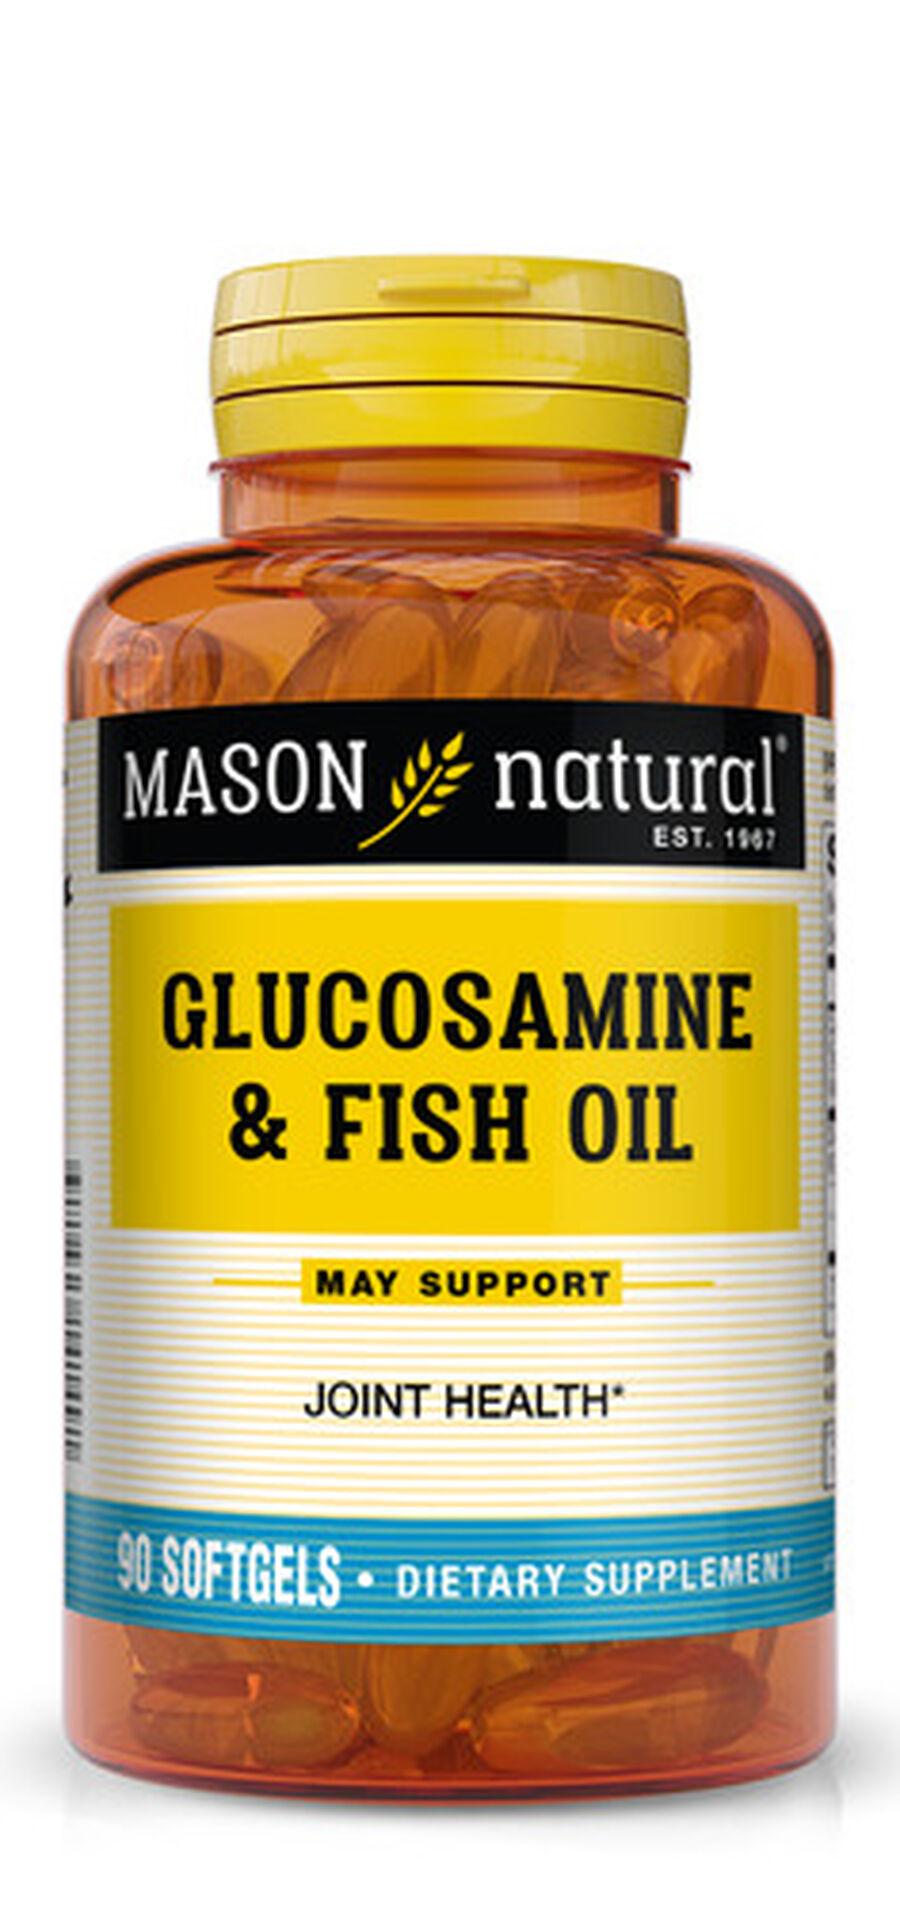 Mason Vitamins Natural Glucosamine & Fish Oil,  90 softgels, , large image number 0